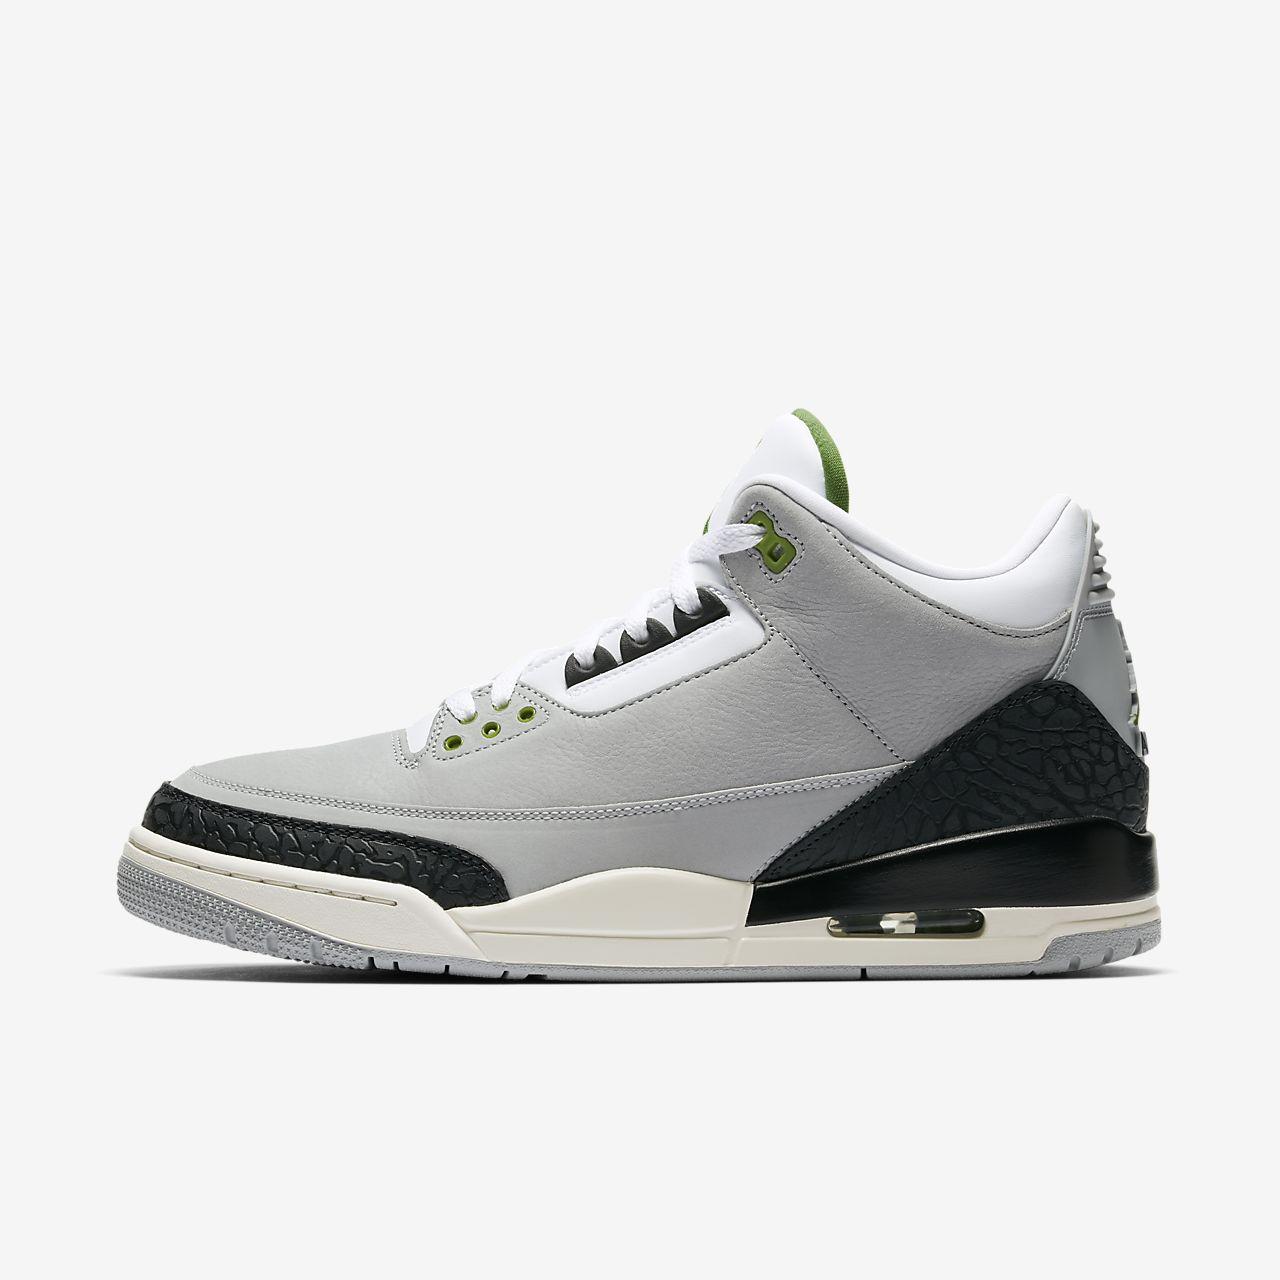 quality design fea95 88209 Air Jordan 3 Retro-sko til mænd. Nike.com DK